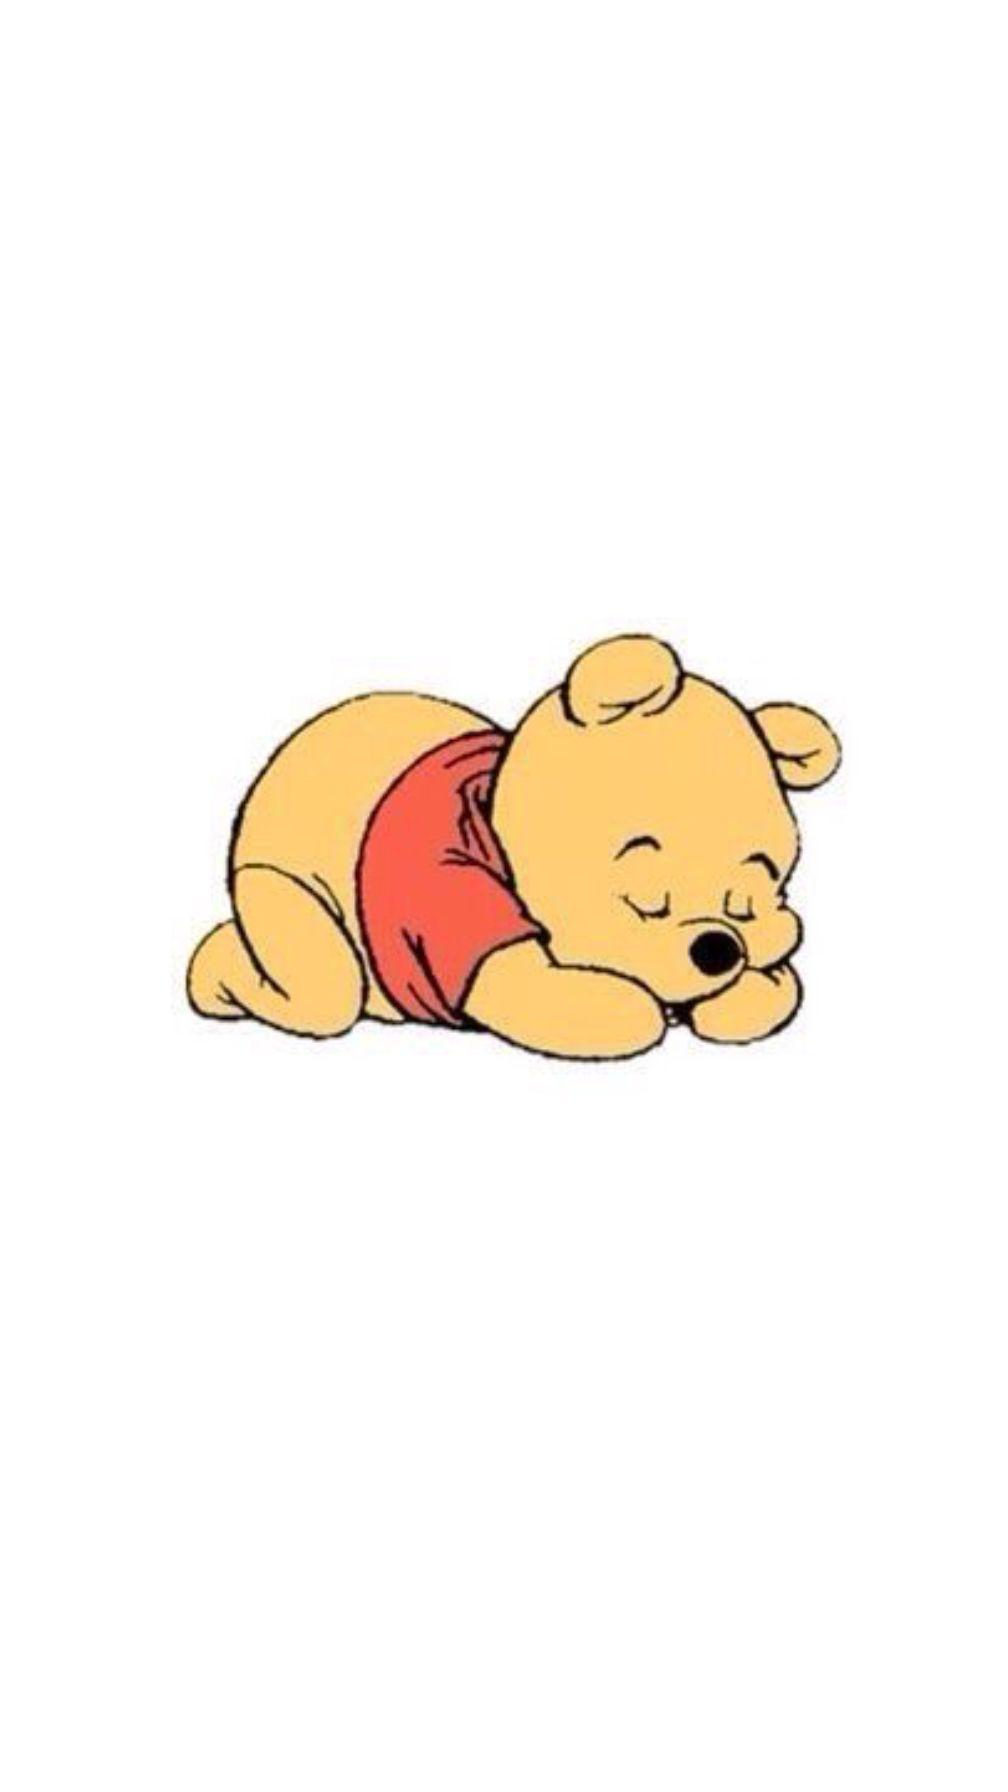 Pooh Bear Art Nel 2019 Disegni Disney Winnie The Pooh E Idee